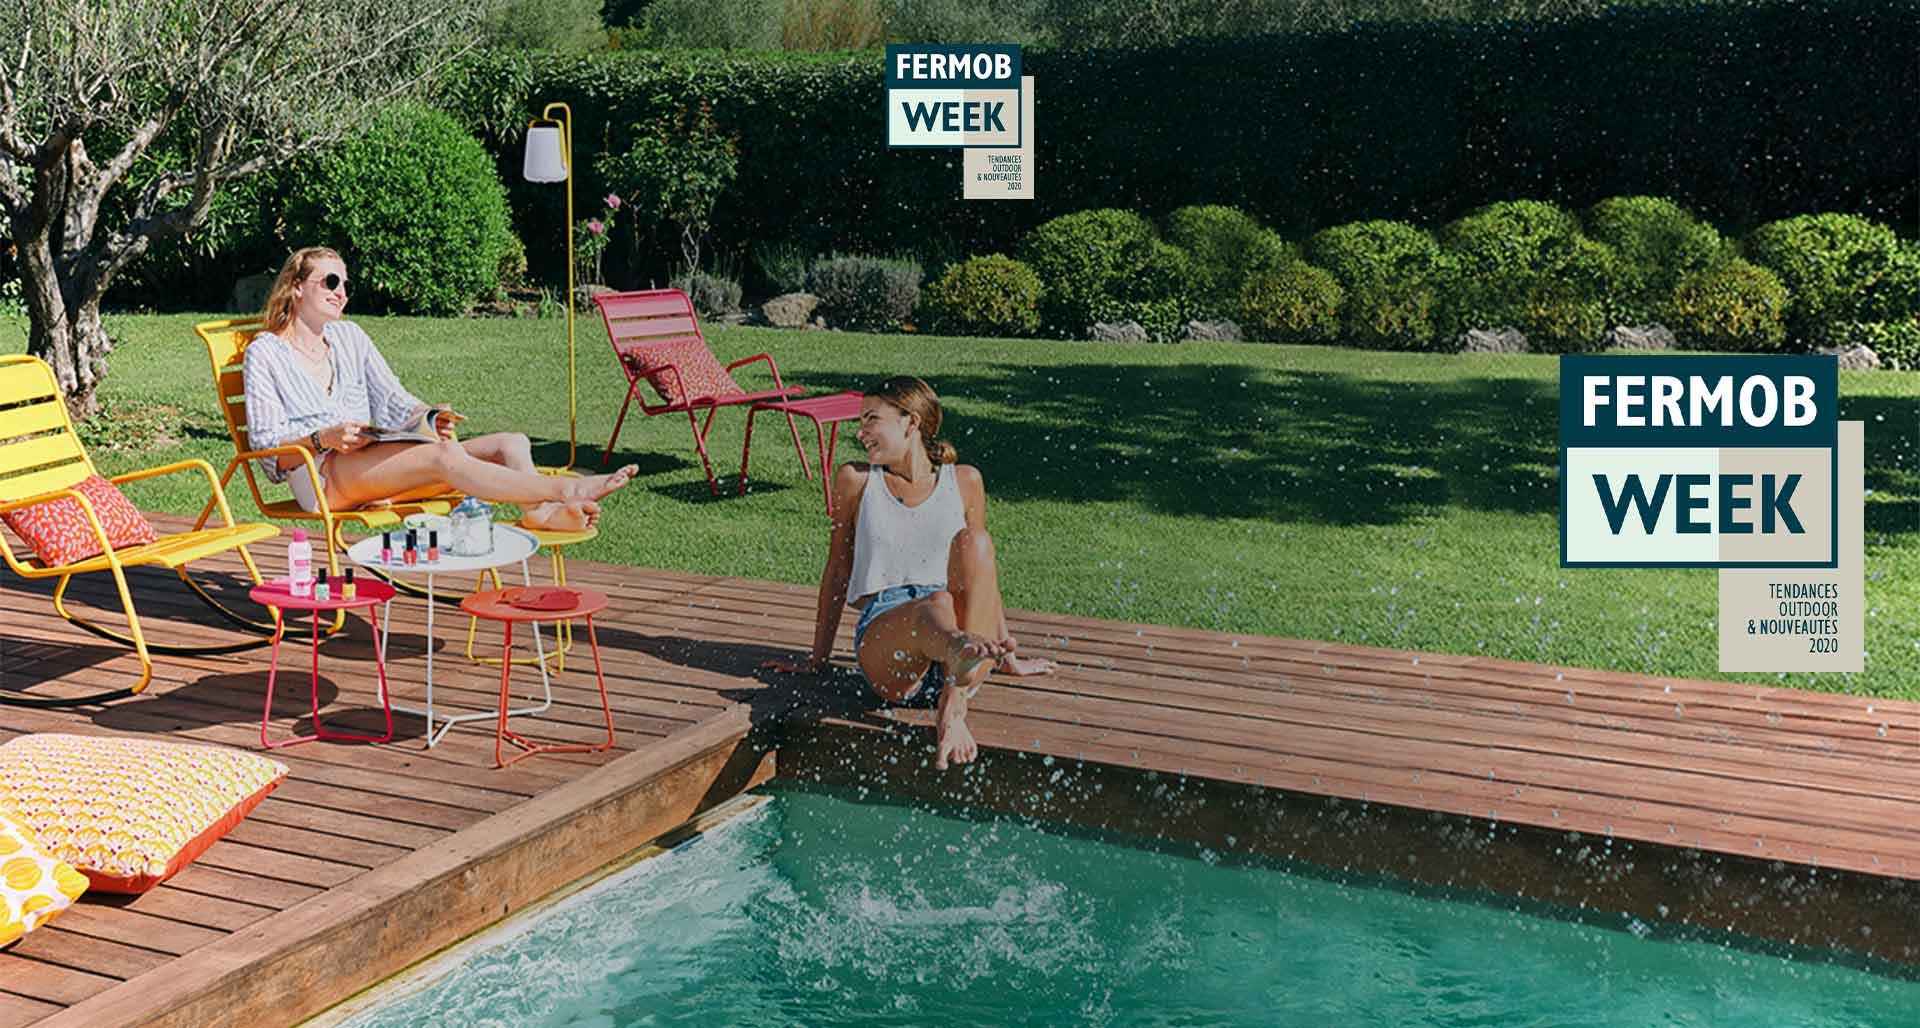 Jardineries Truffaut : Spécialiste Jardin, Animaux, Maison ... encequiconcerne Gamm Vert Salon De Jardin